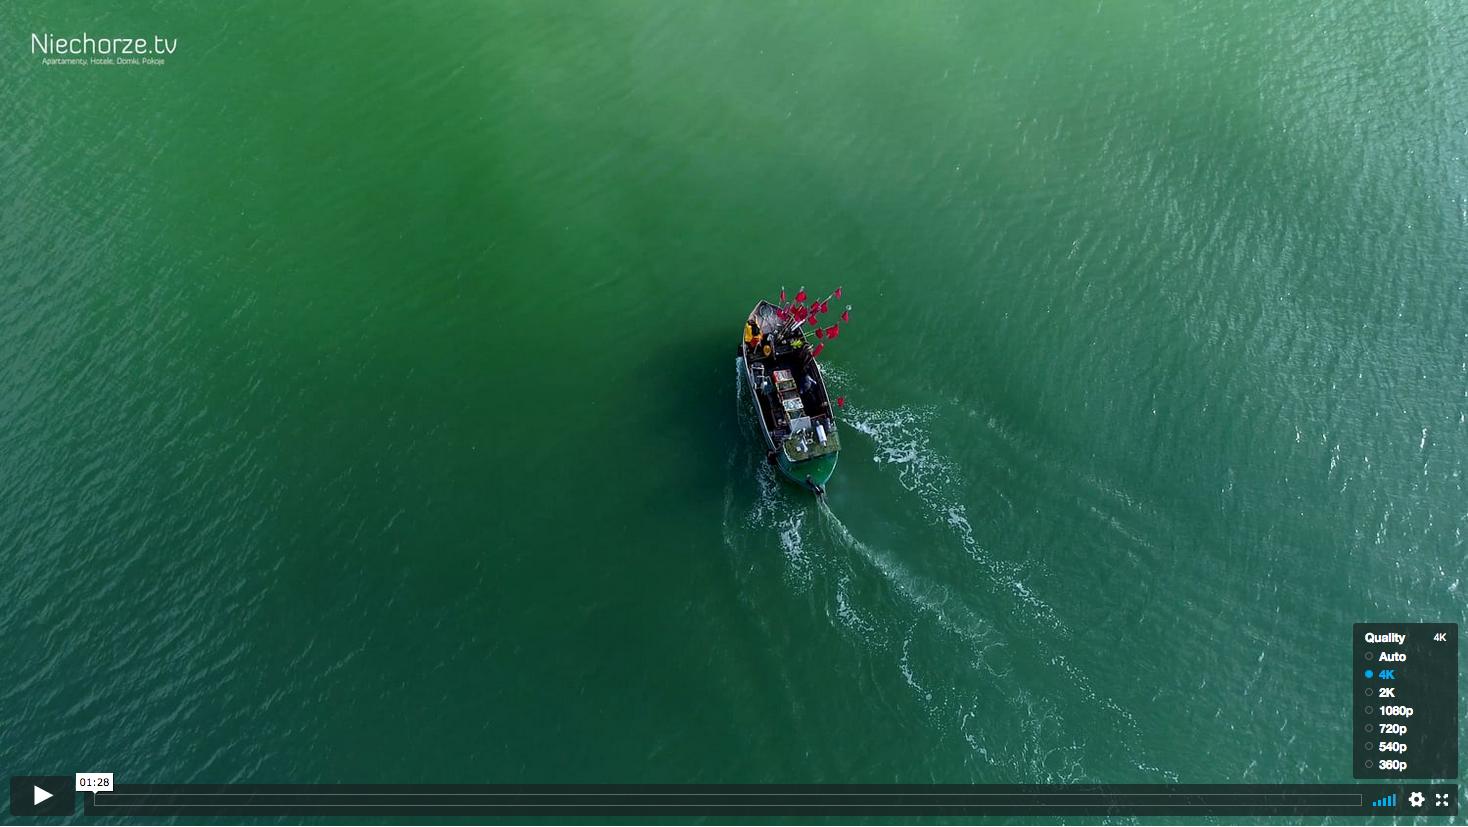 Kuter rybacki nad polskim morzem film z drona